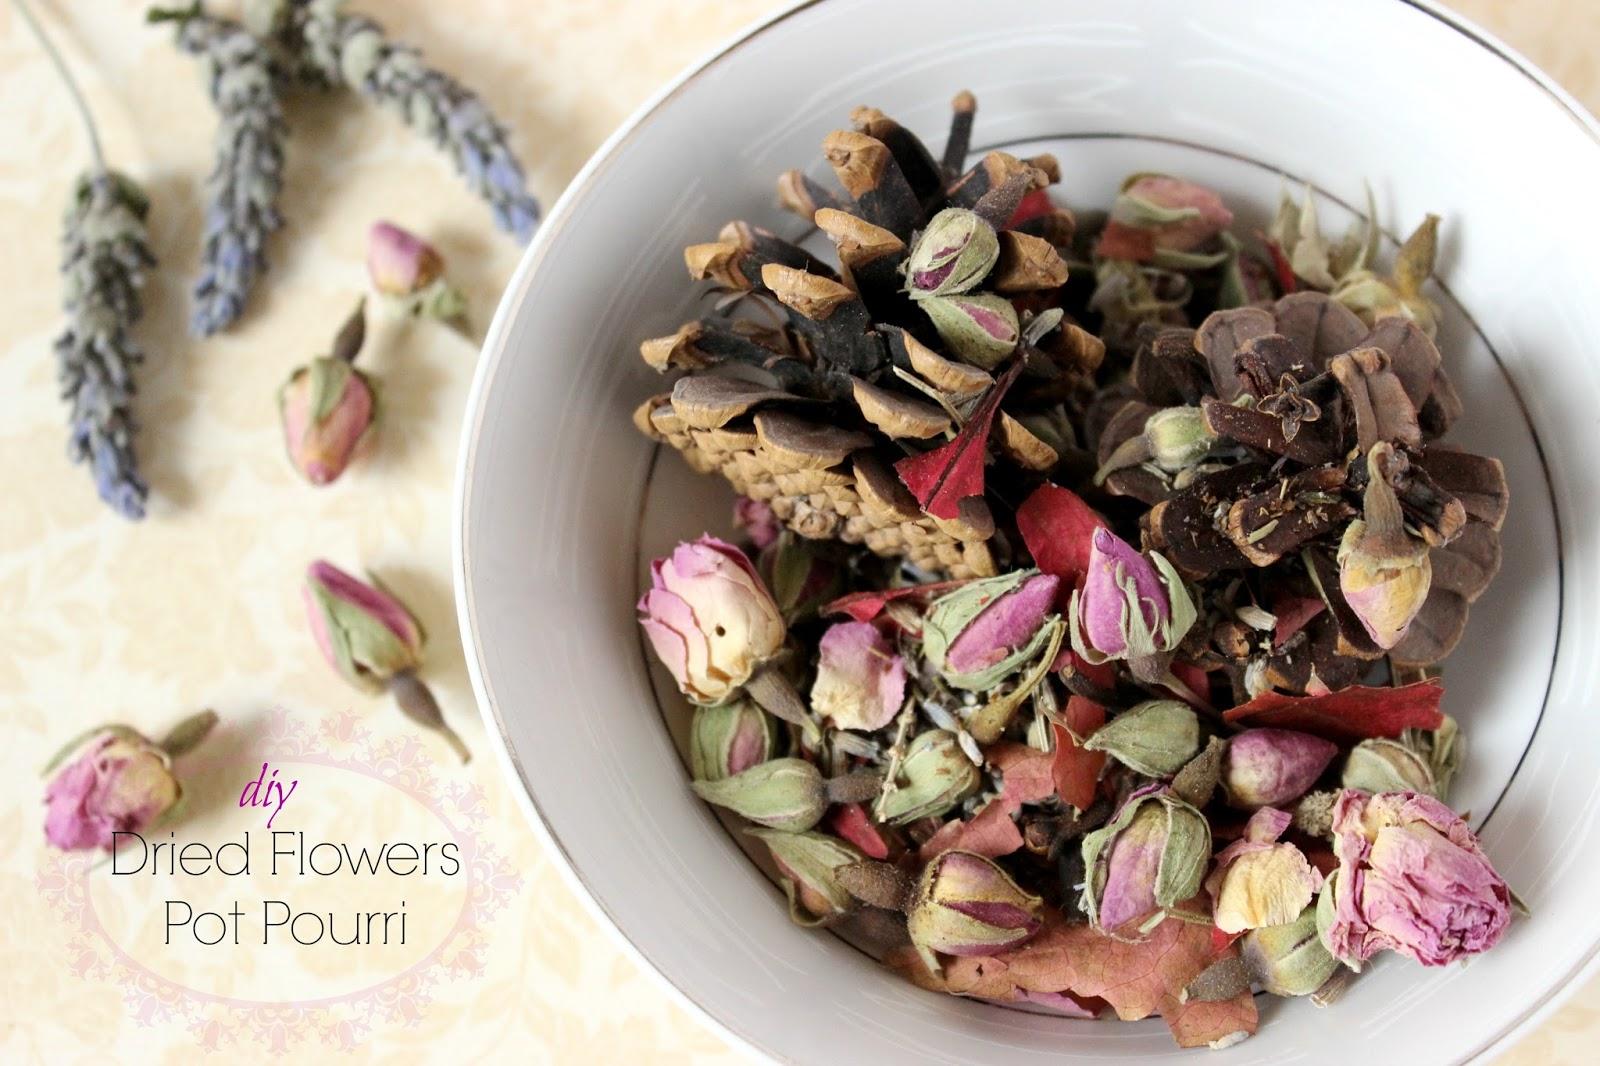 Diy Dried Flowers Pot Pourri Ef Zin Creations